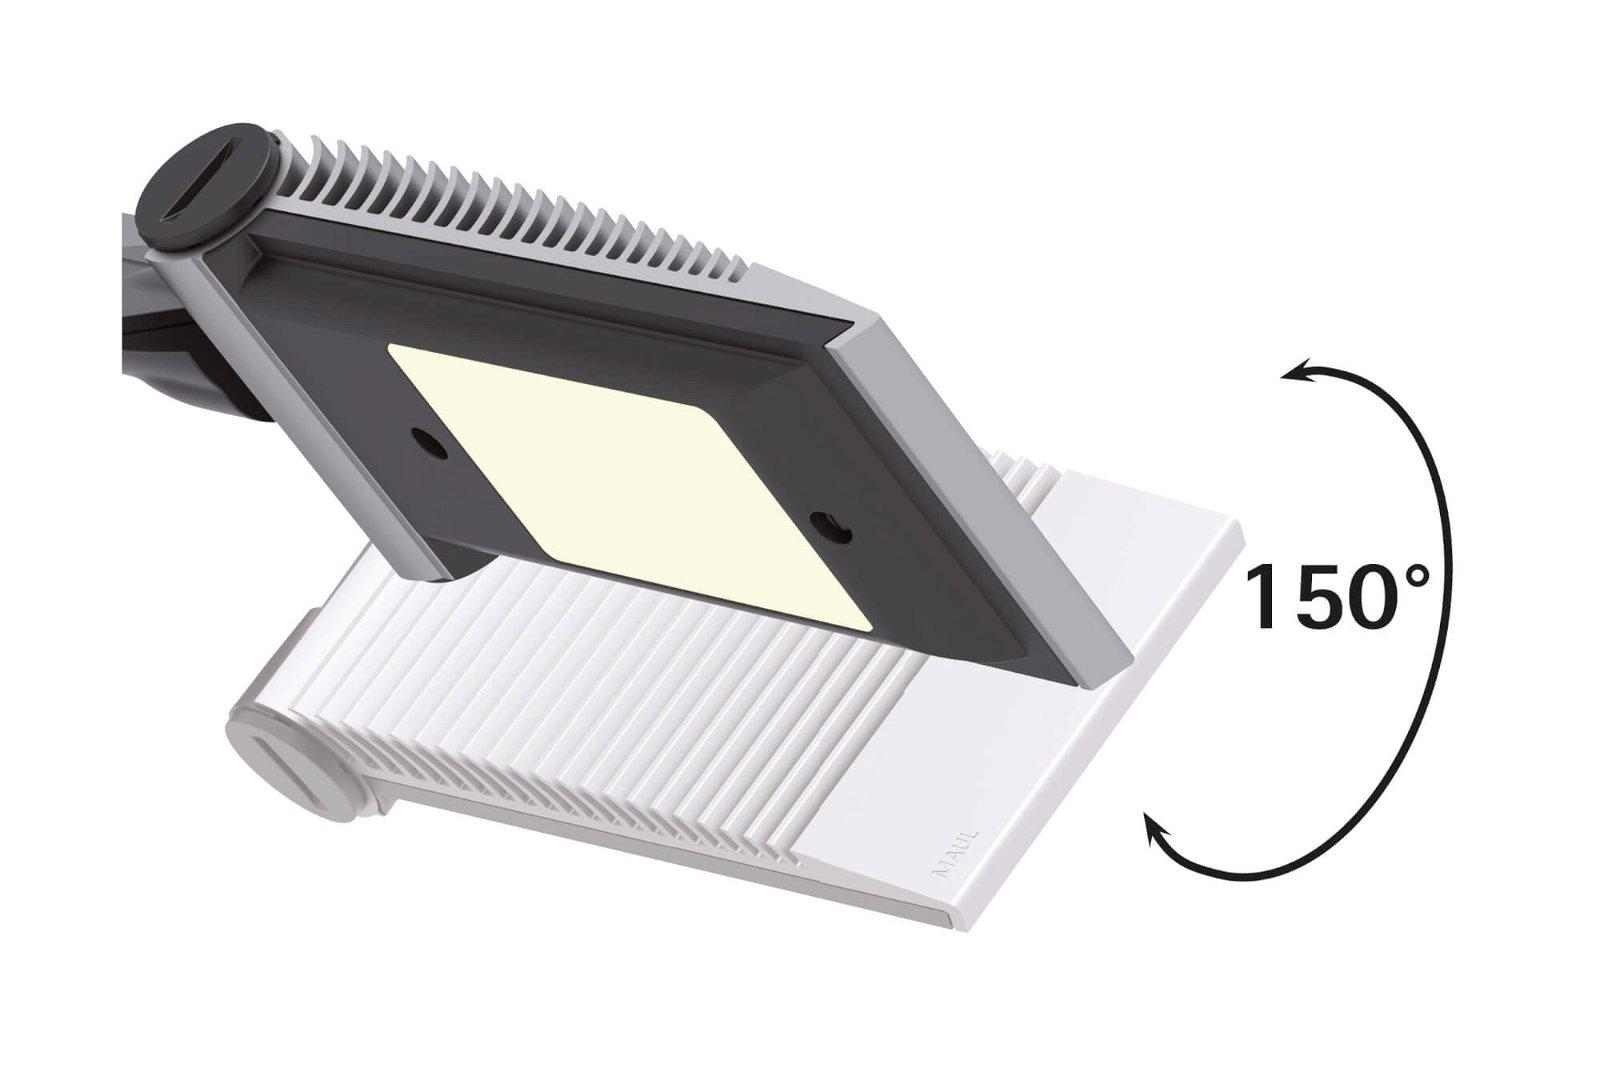 LED-Tischleuchte MAULsolaris, silber